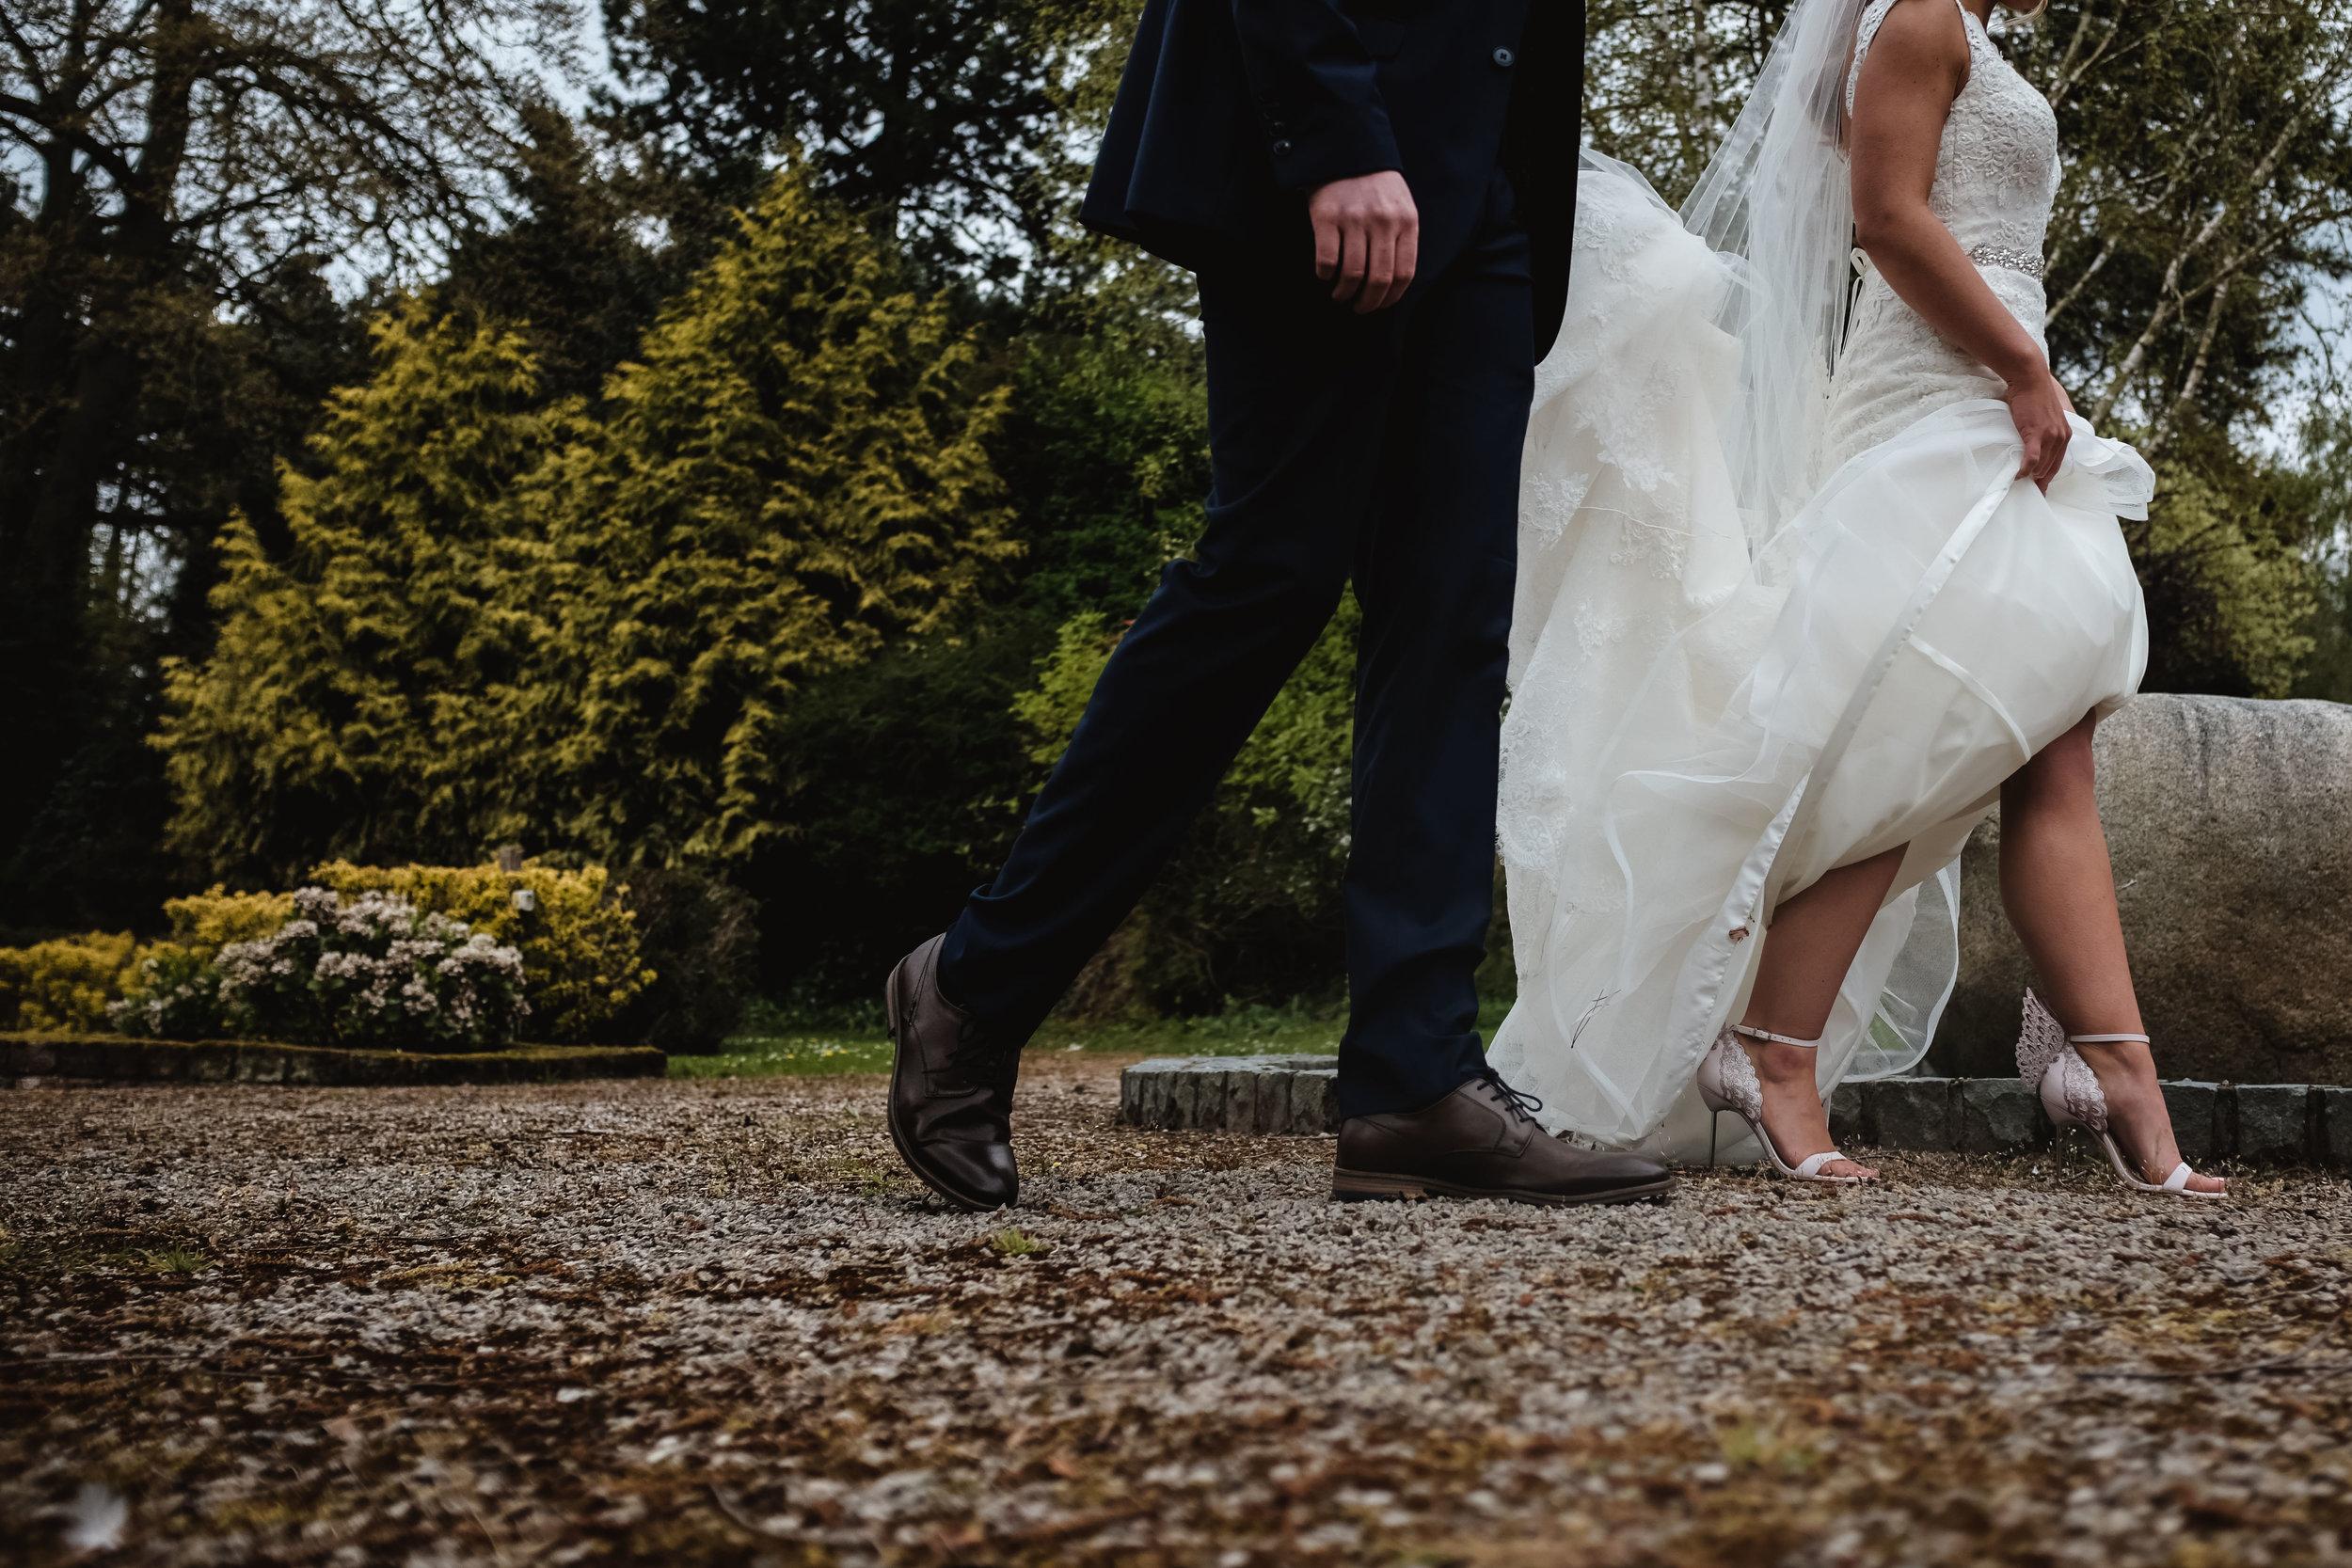 Thornton manor wedding photography cheshire wedding photographer liverpool manchester warrington chester wirral wedding BLOG (56 of 108).jpg